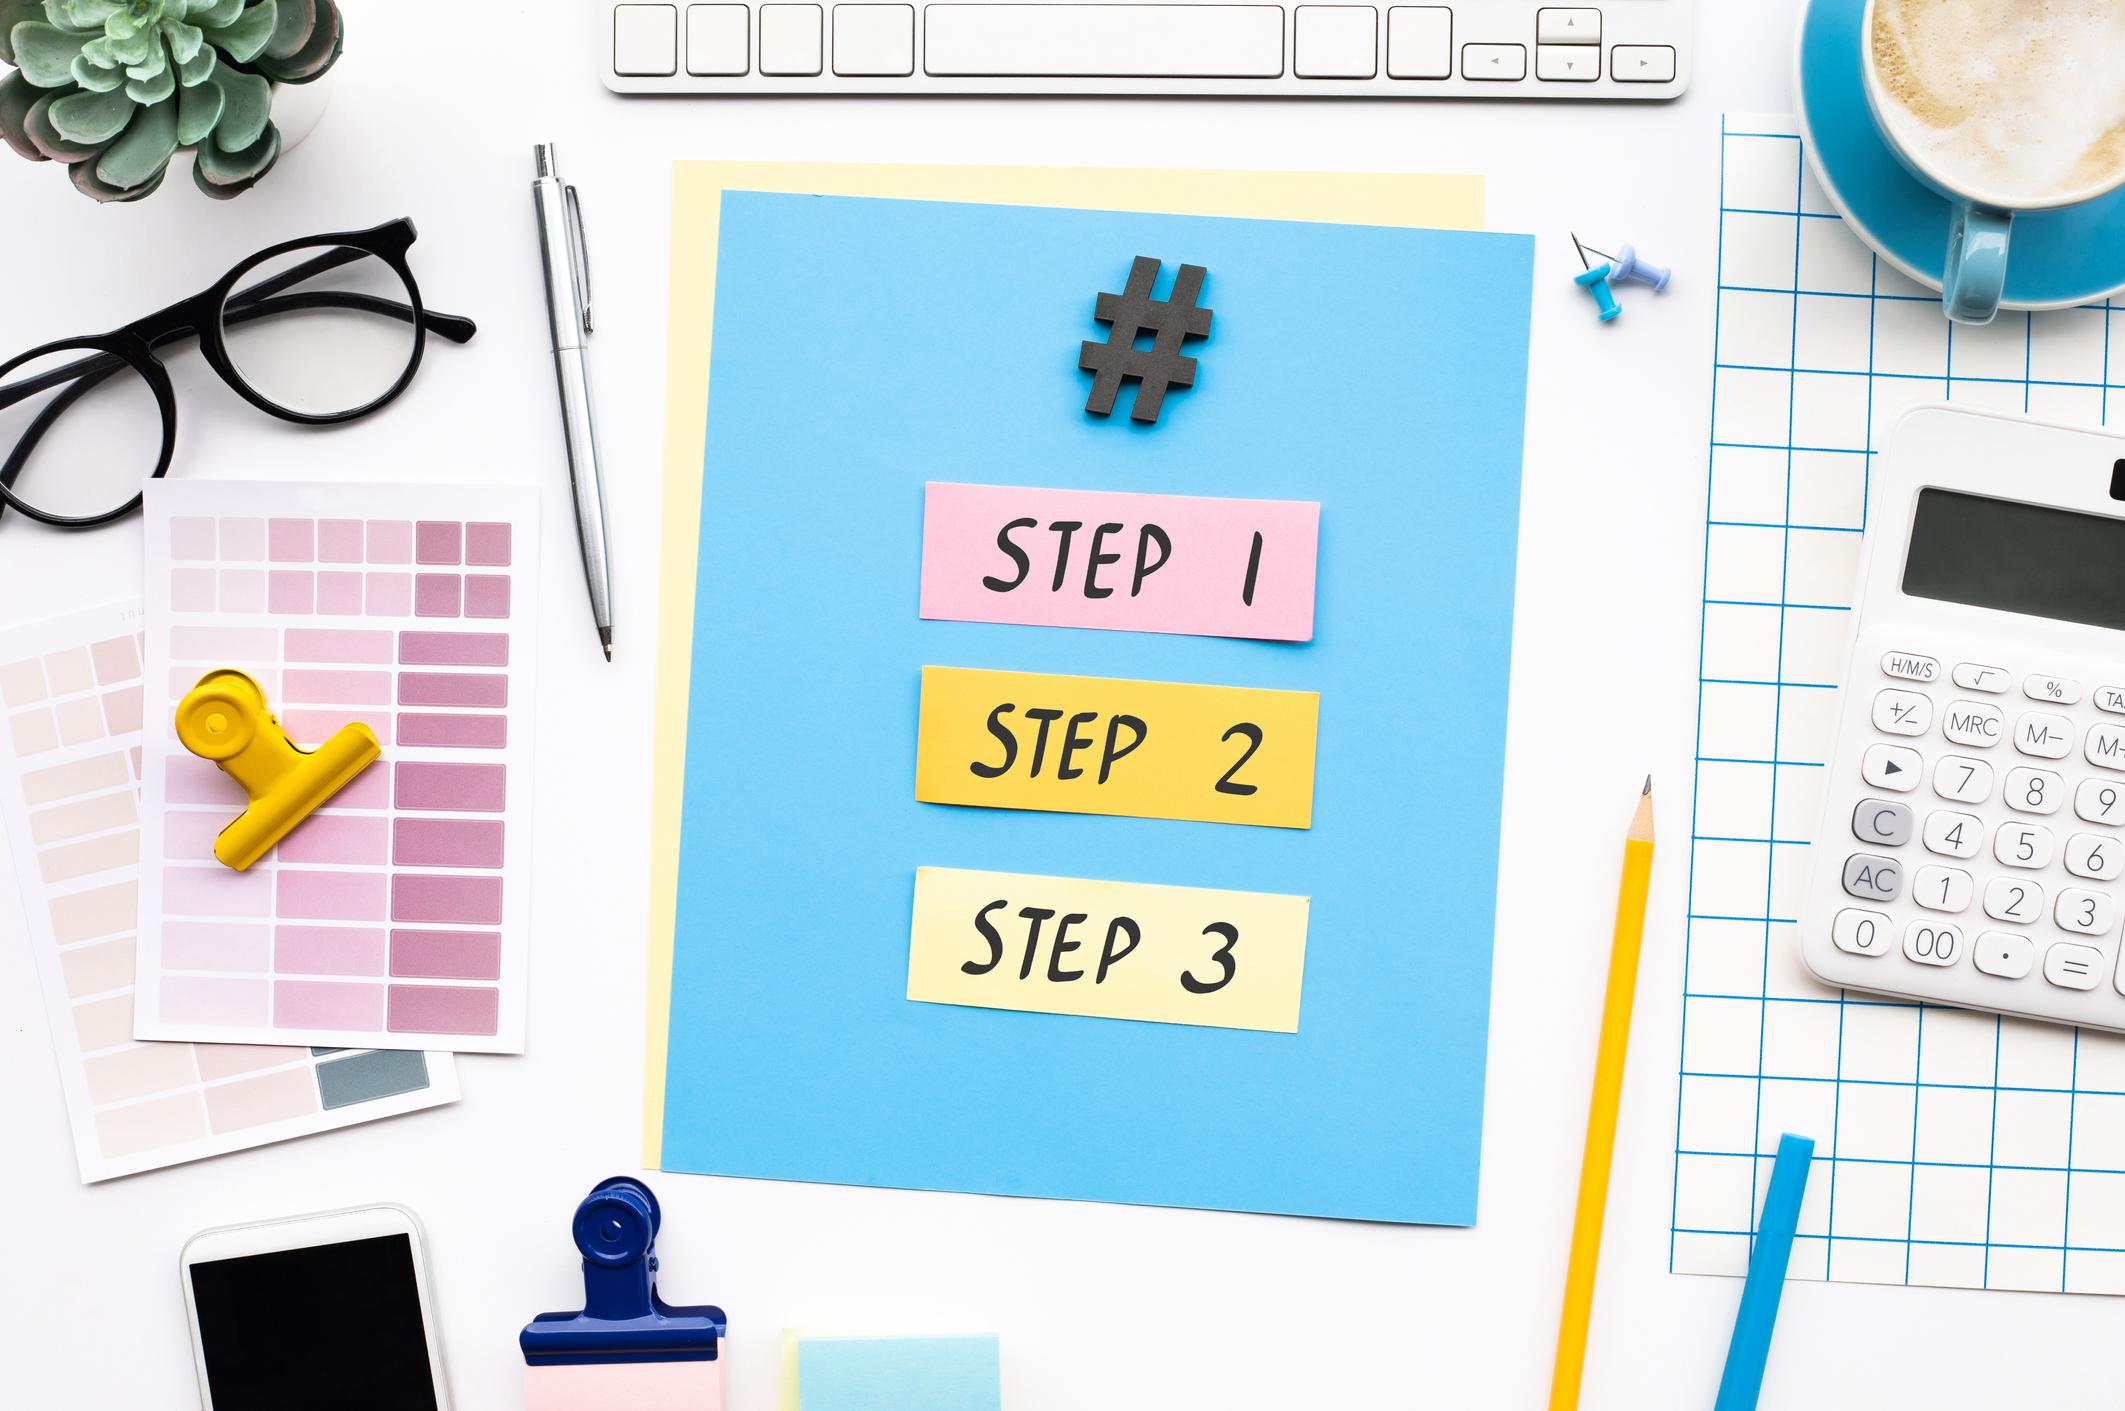 Steps to success demand channels